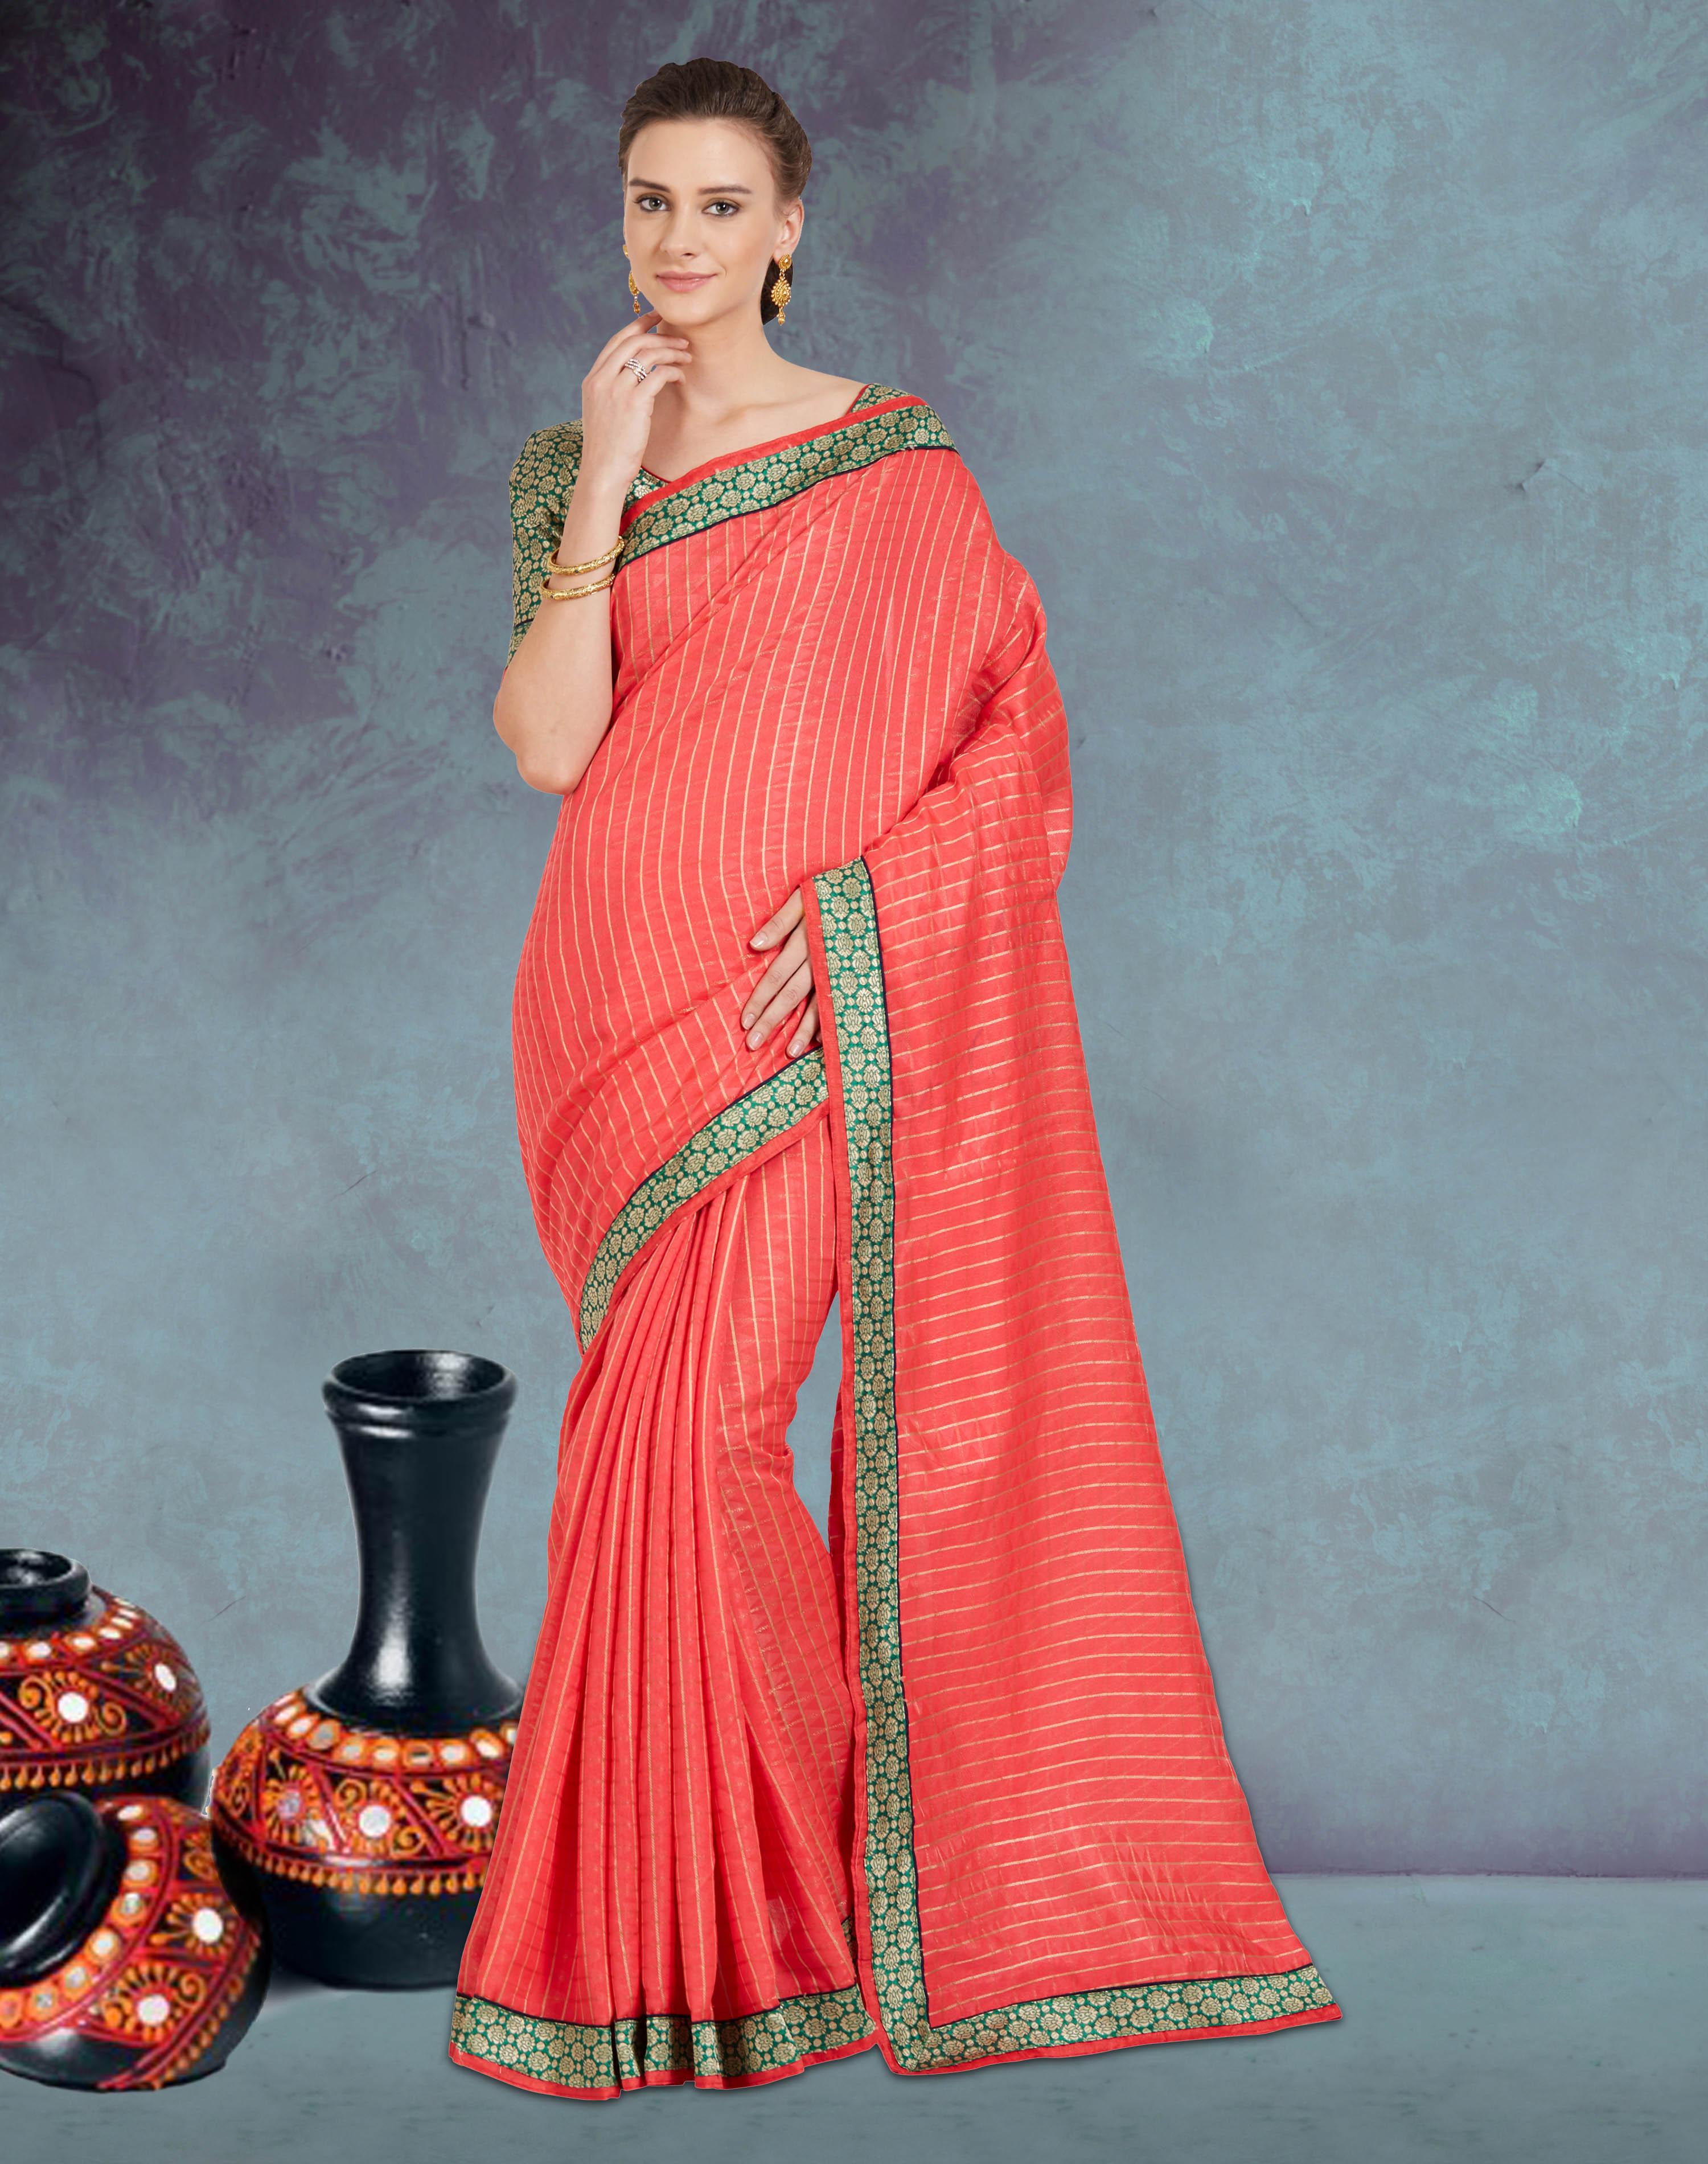 bef911b5085ac0 Peach plain cotton silk saree with blouse - Viva N Diva - 2647771